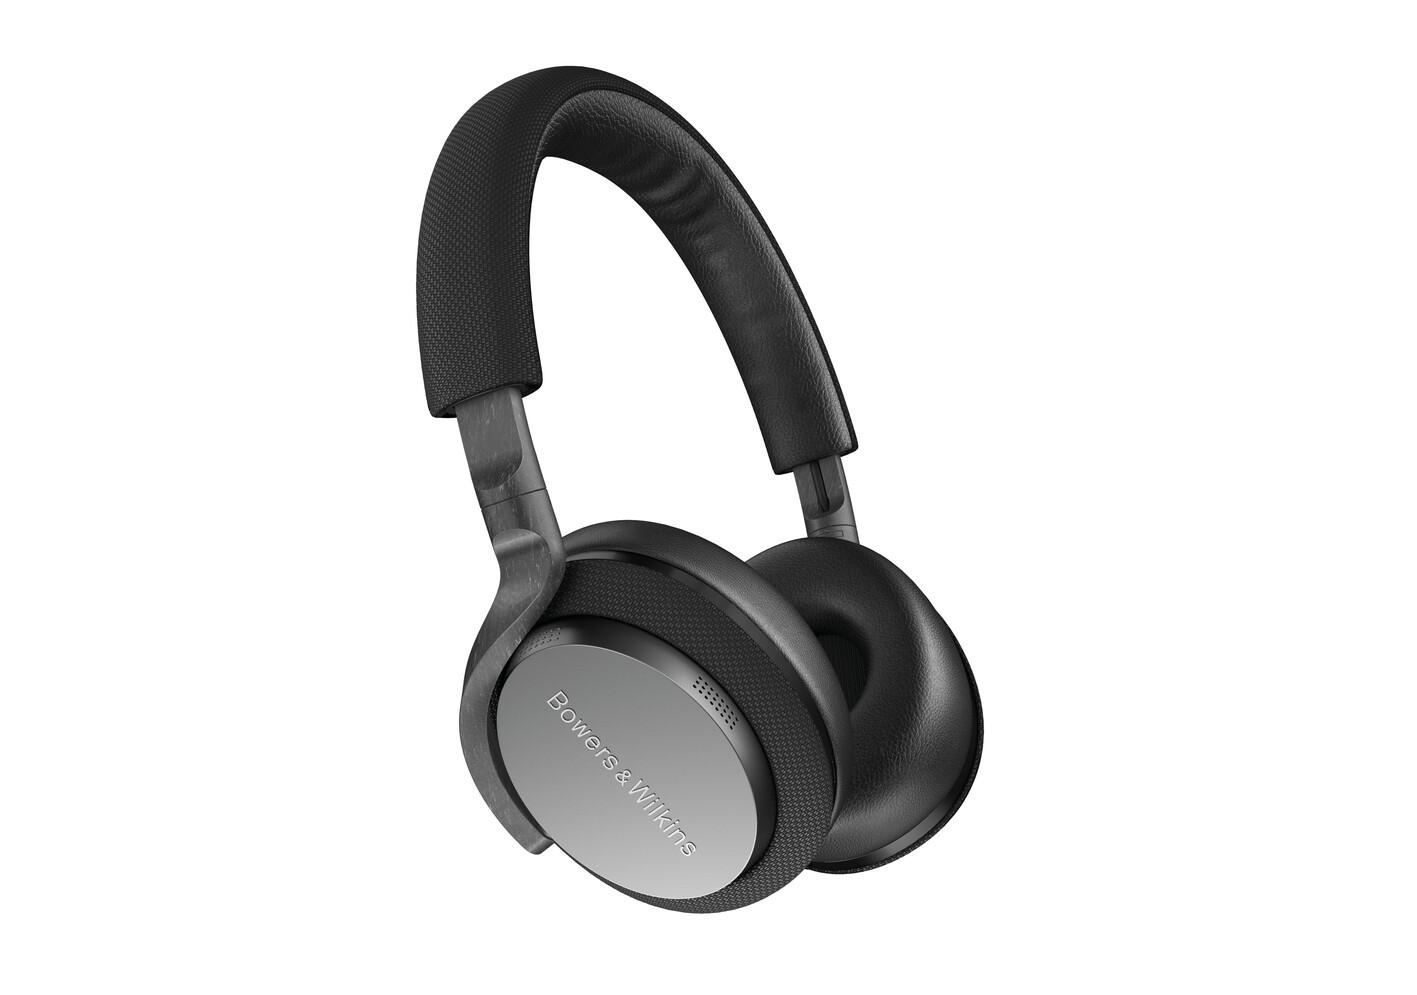 Bowers-Wilkins-PX5-im-Test-On-Ear-Kopfh-rer-mit-Hifi-Charakter-